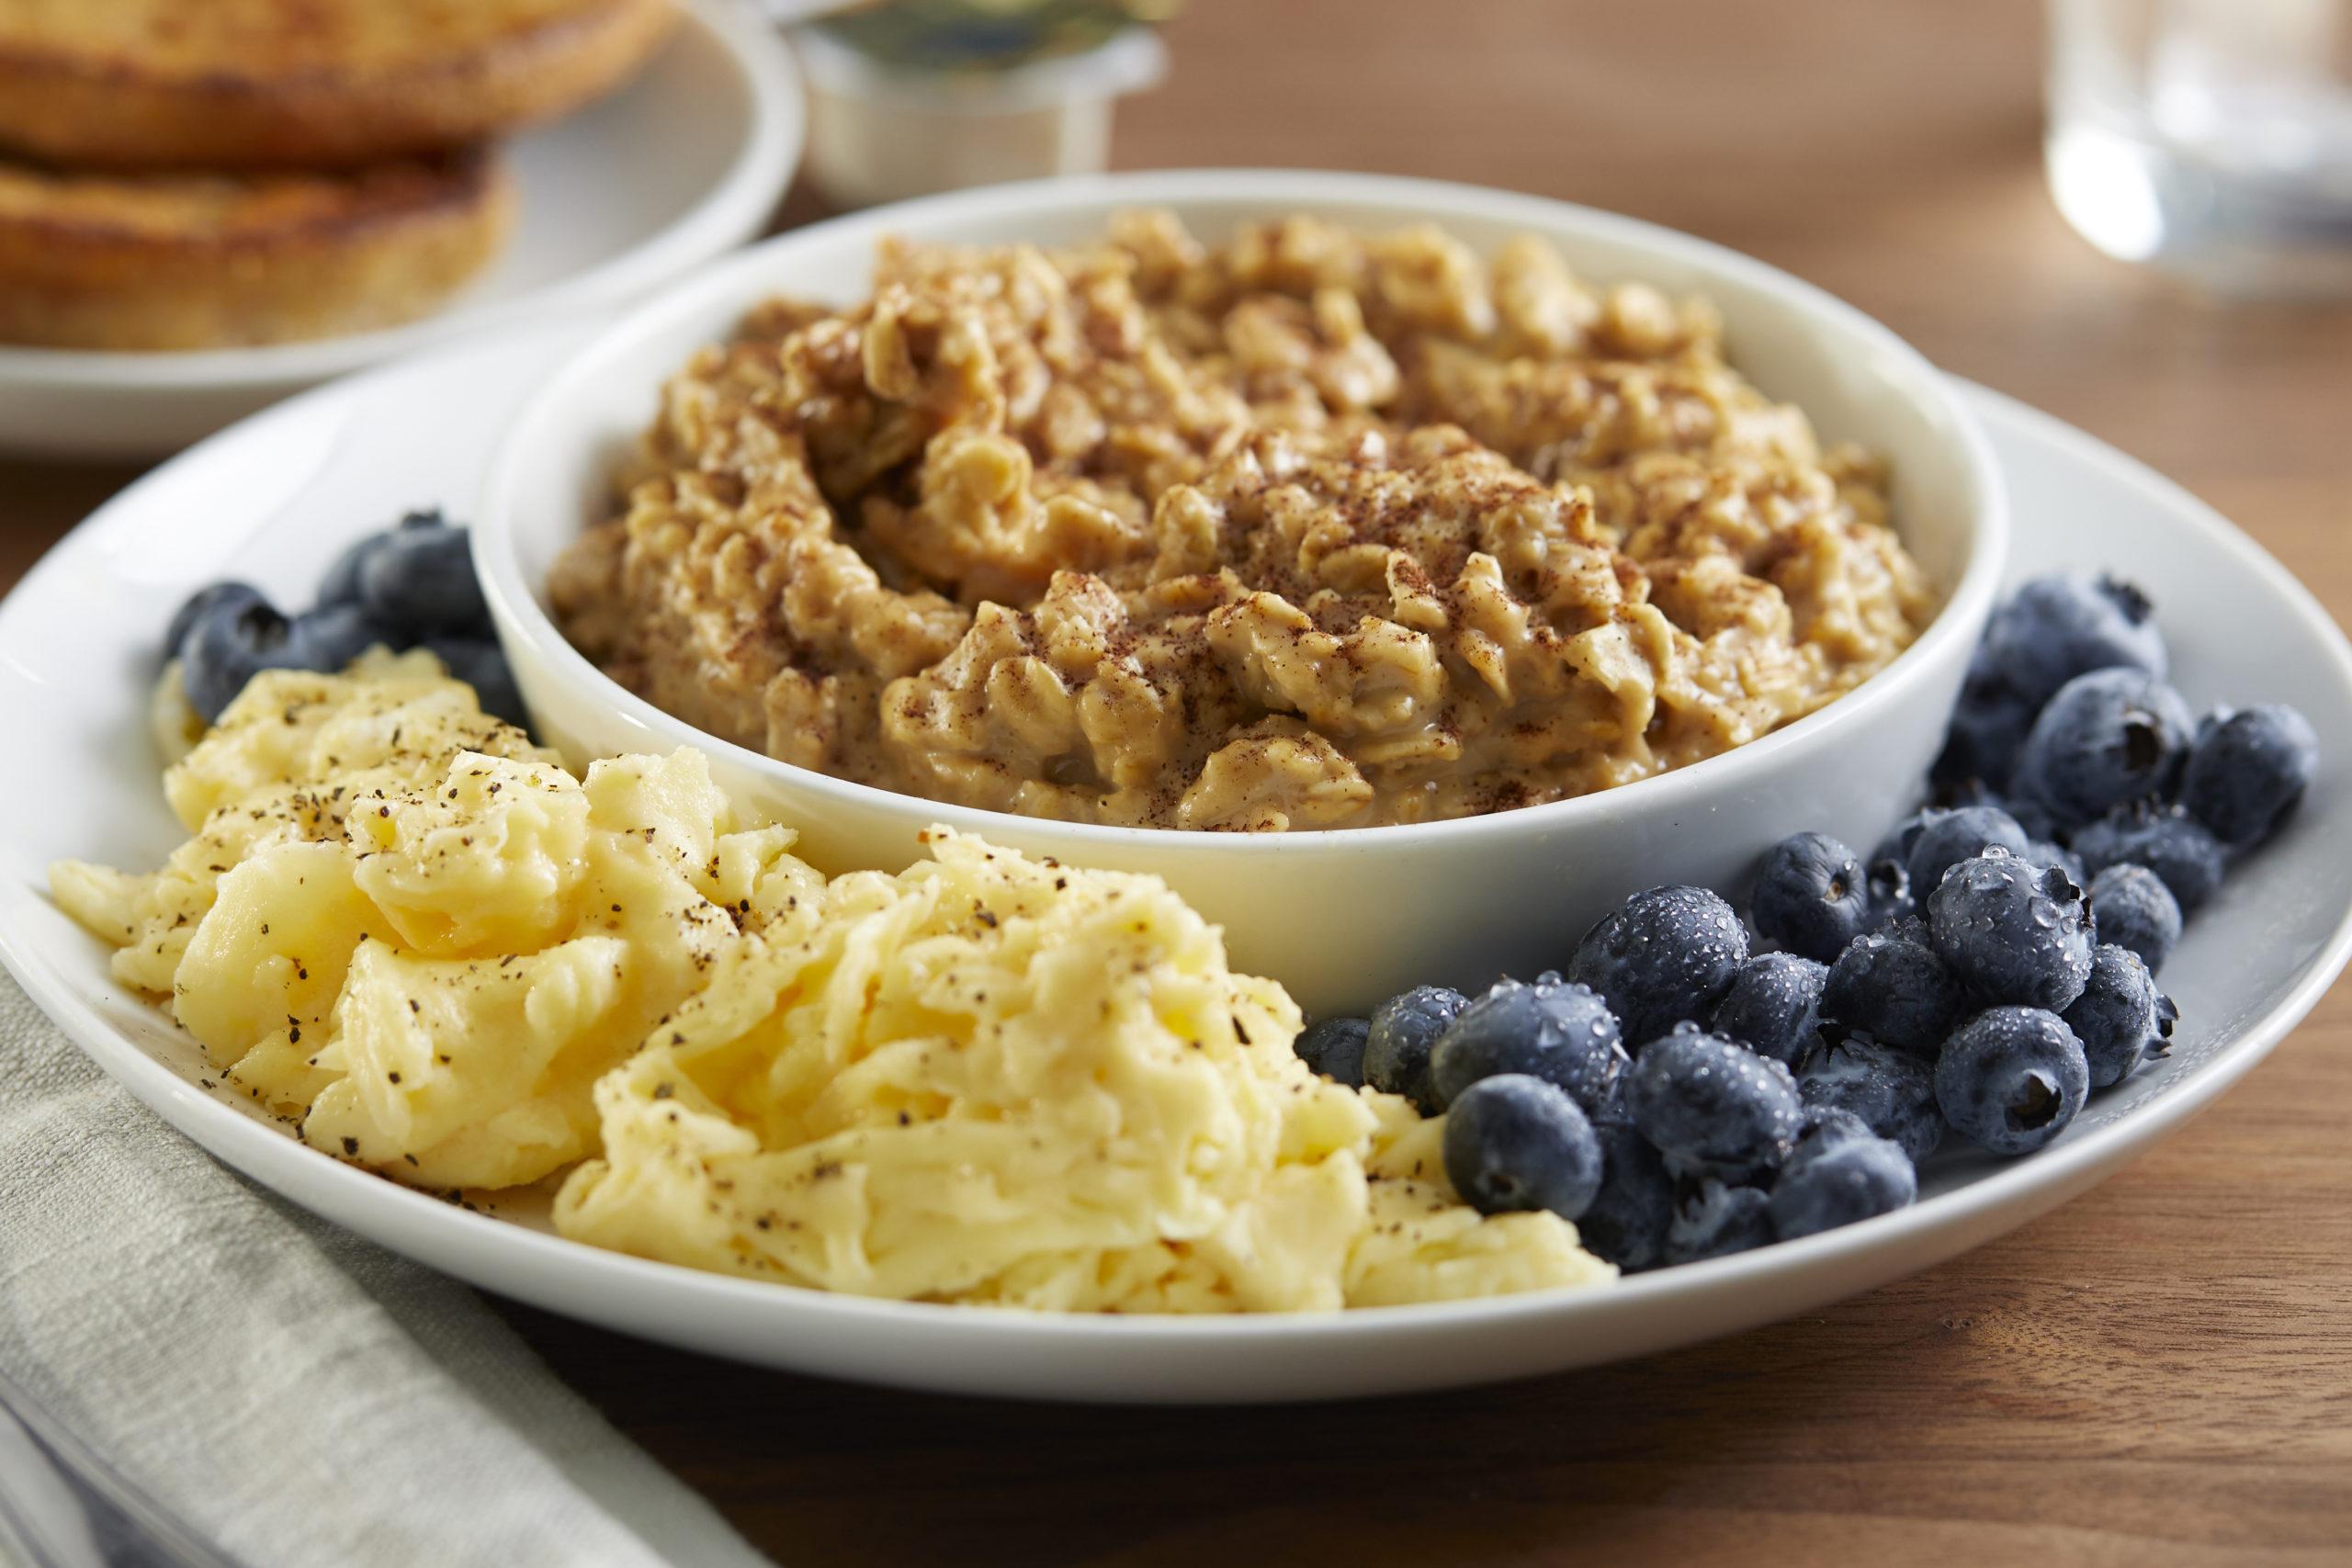 Peanut Butter Blueberry Oatmeal